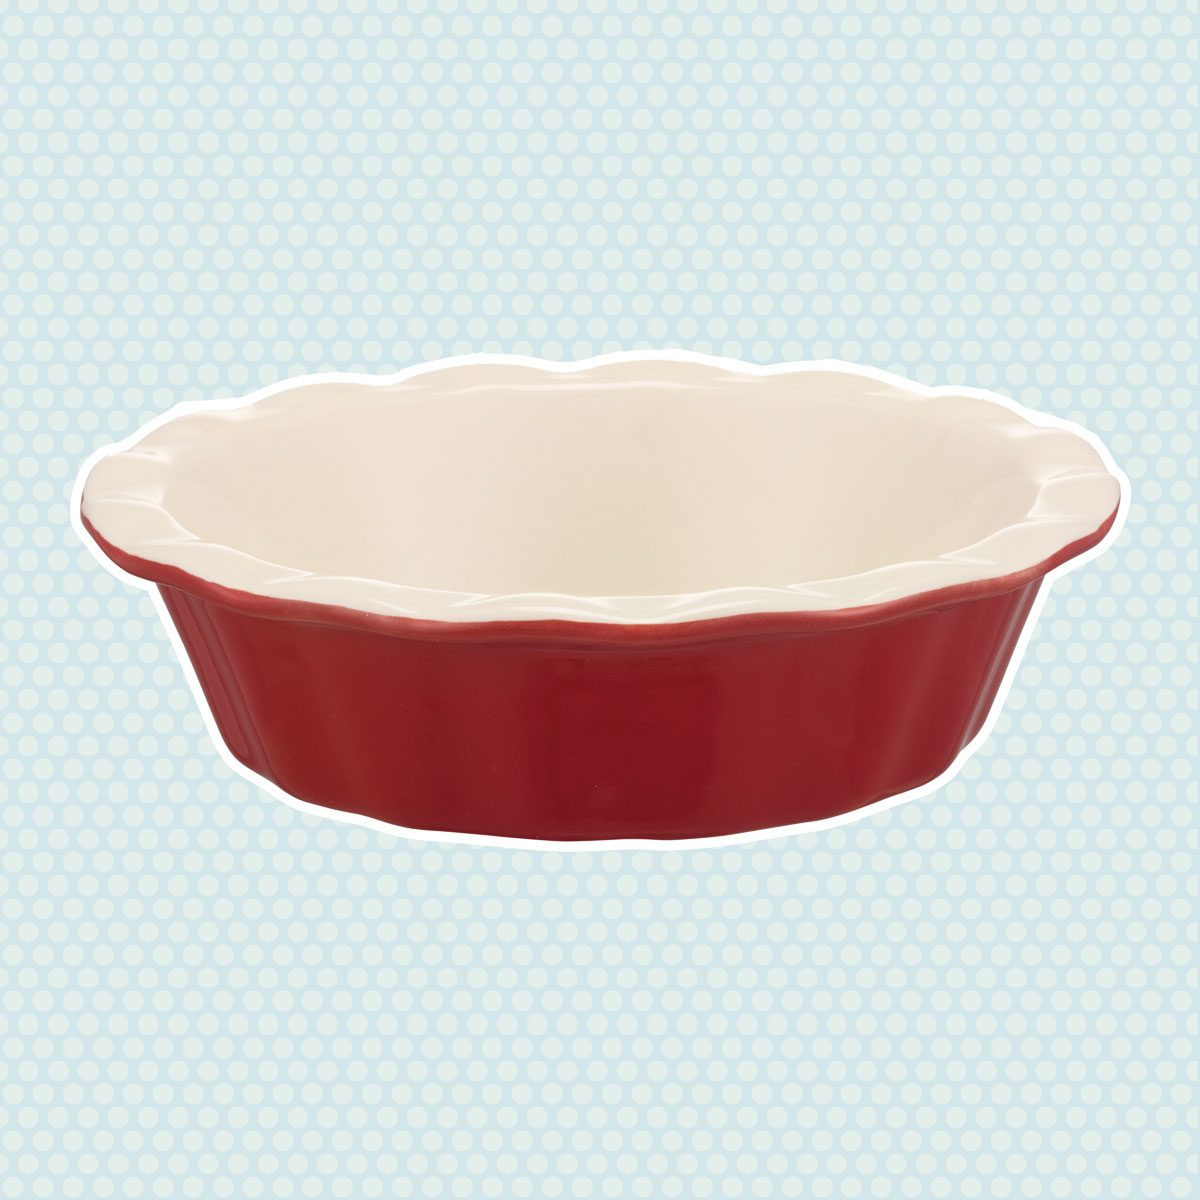 Crofton Mini Ceramic Baking Dishes